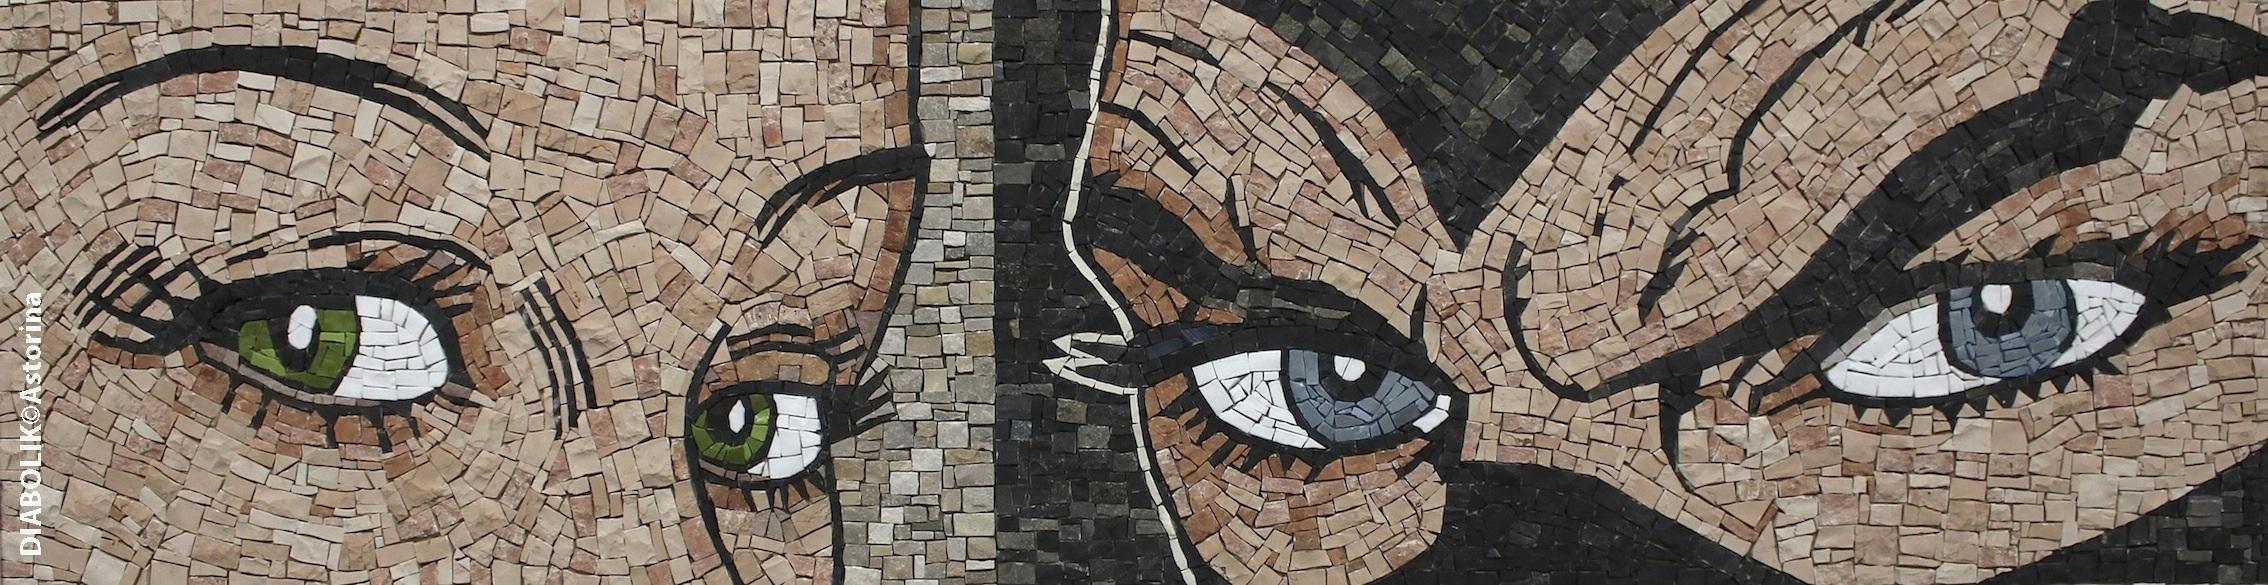 Mosaico di Eva e Diabolik, pezzo unico